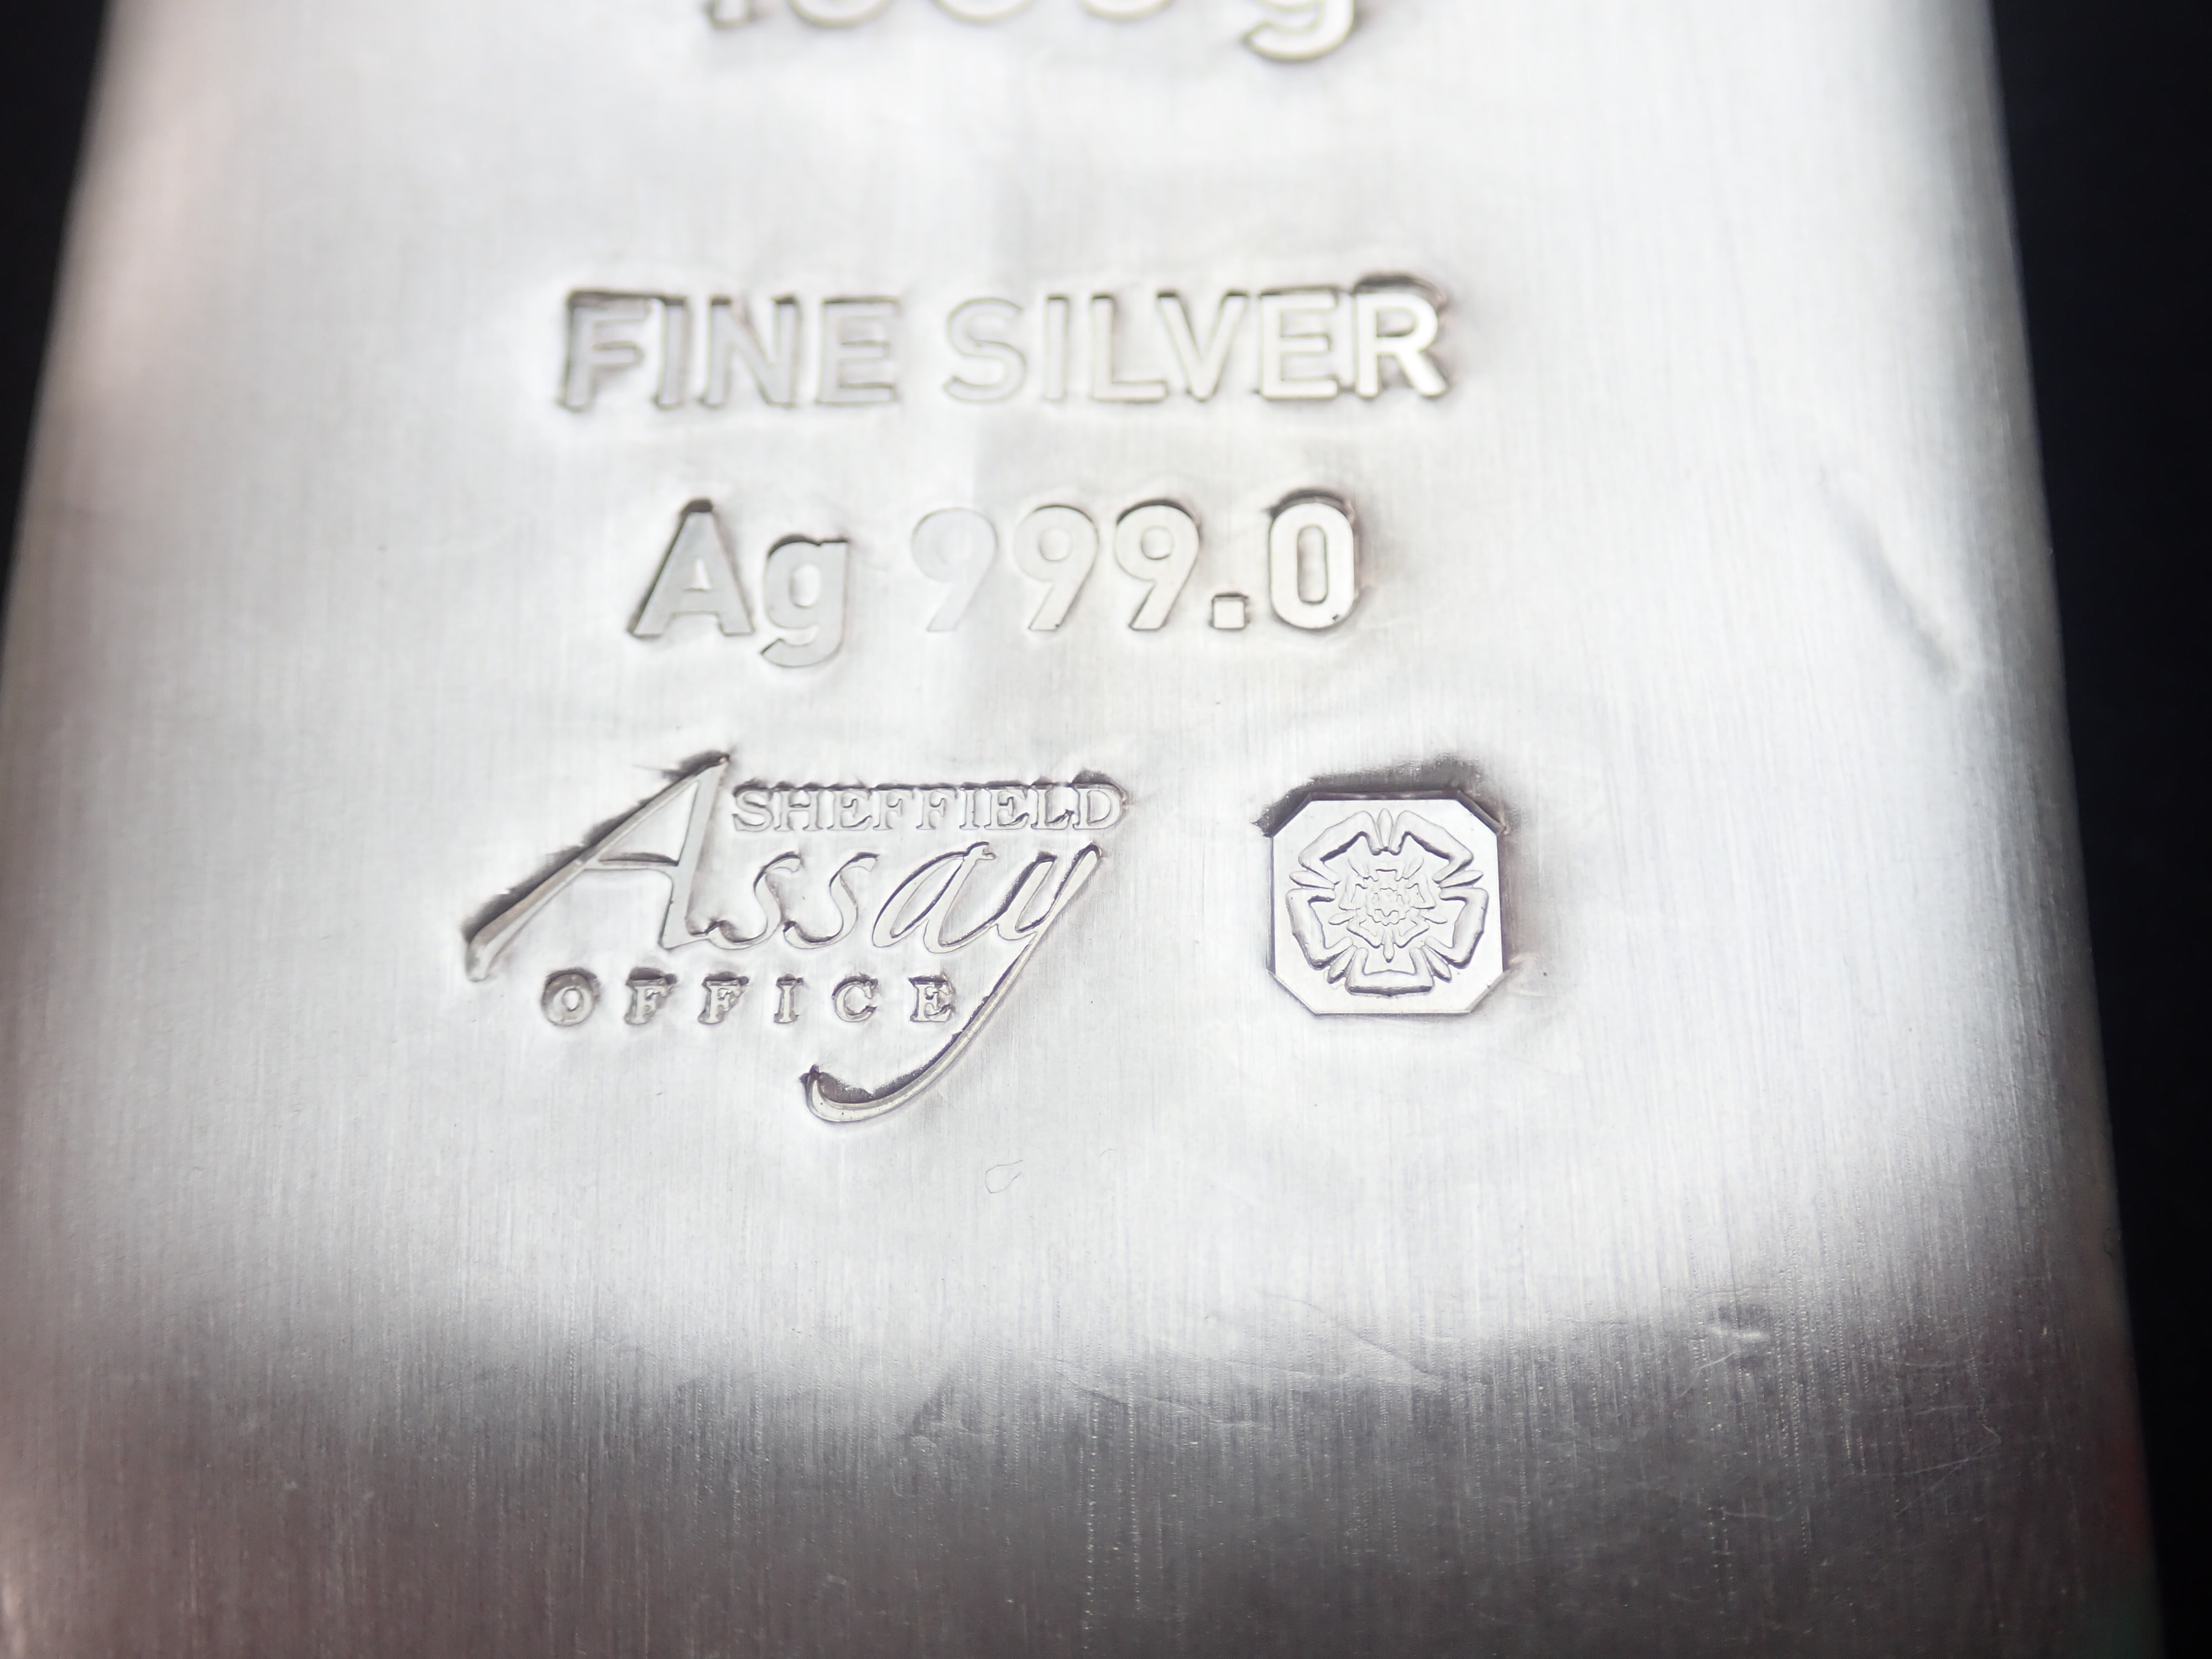 AZZ00602 - Unimet 1000g / 1 Kilo  Fine Silver Ag 999.0 Cast Bar